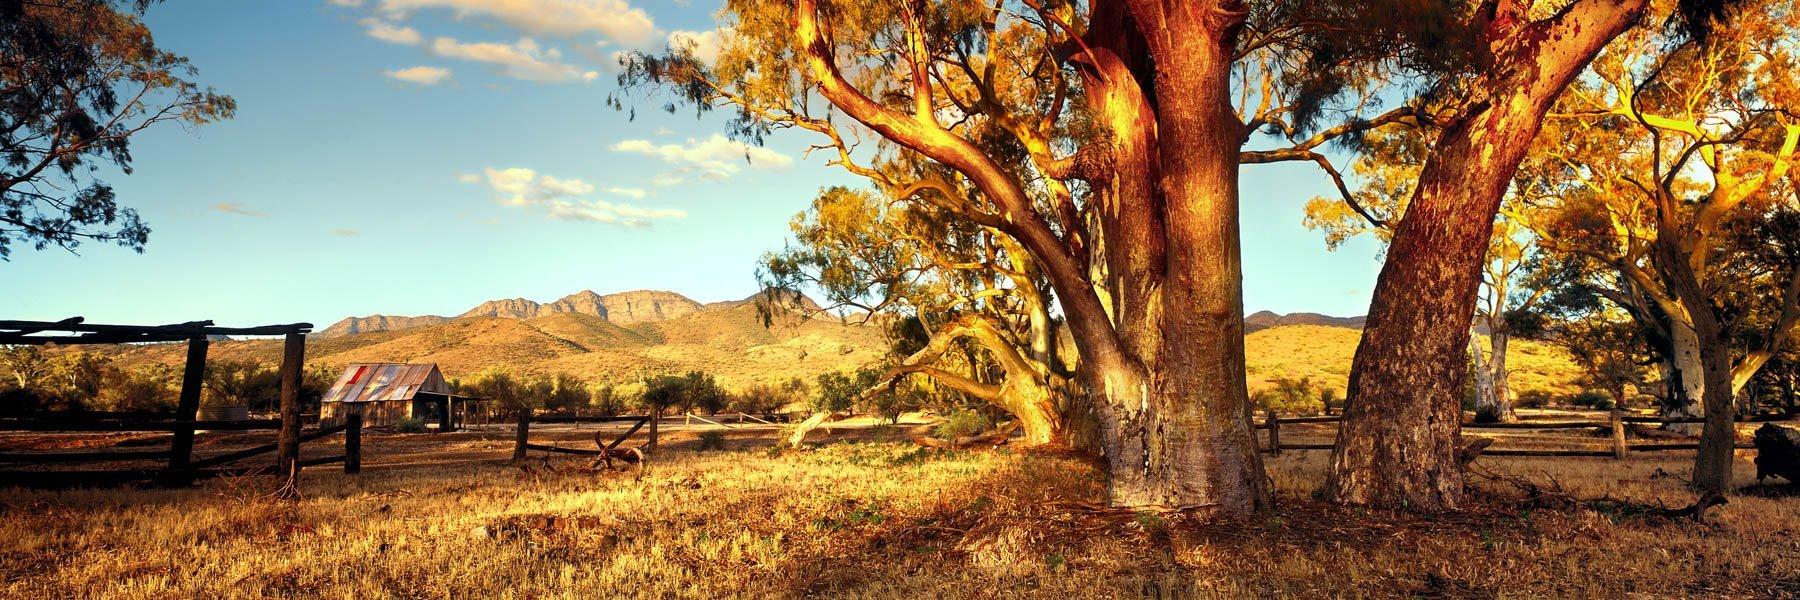 Golden light on river gums in the Flinders Ranges, SA, Australia.